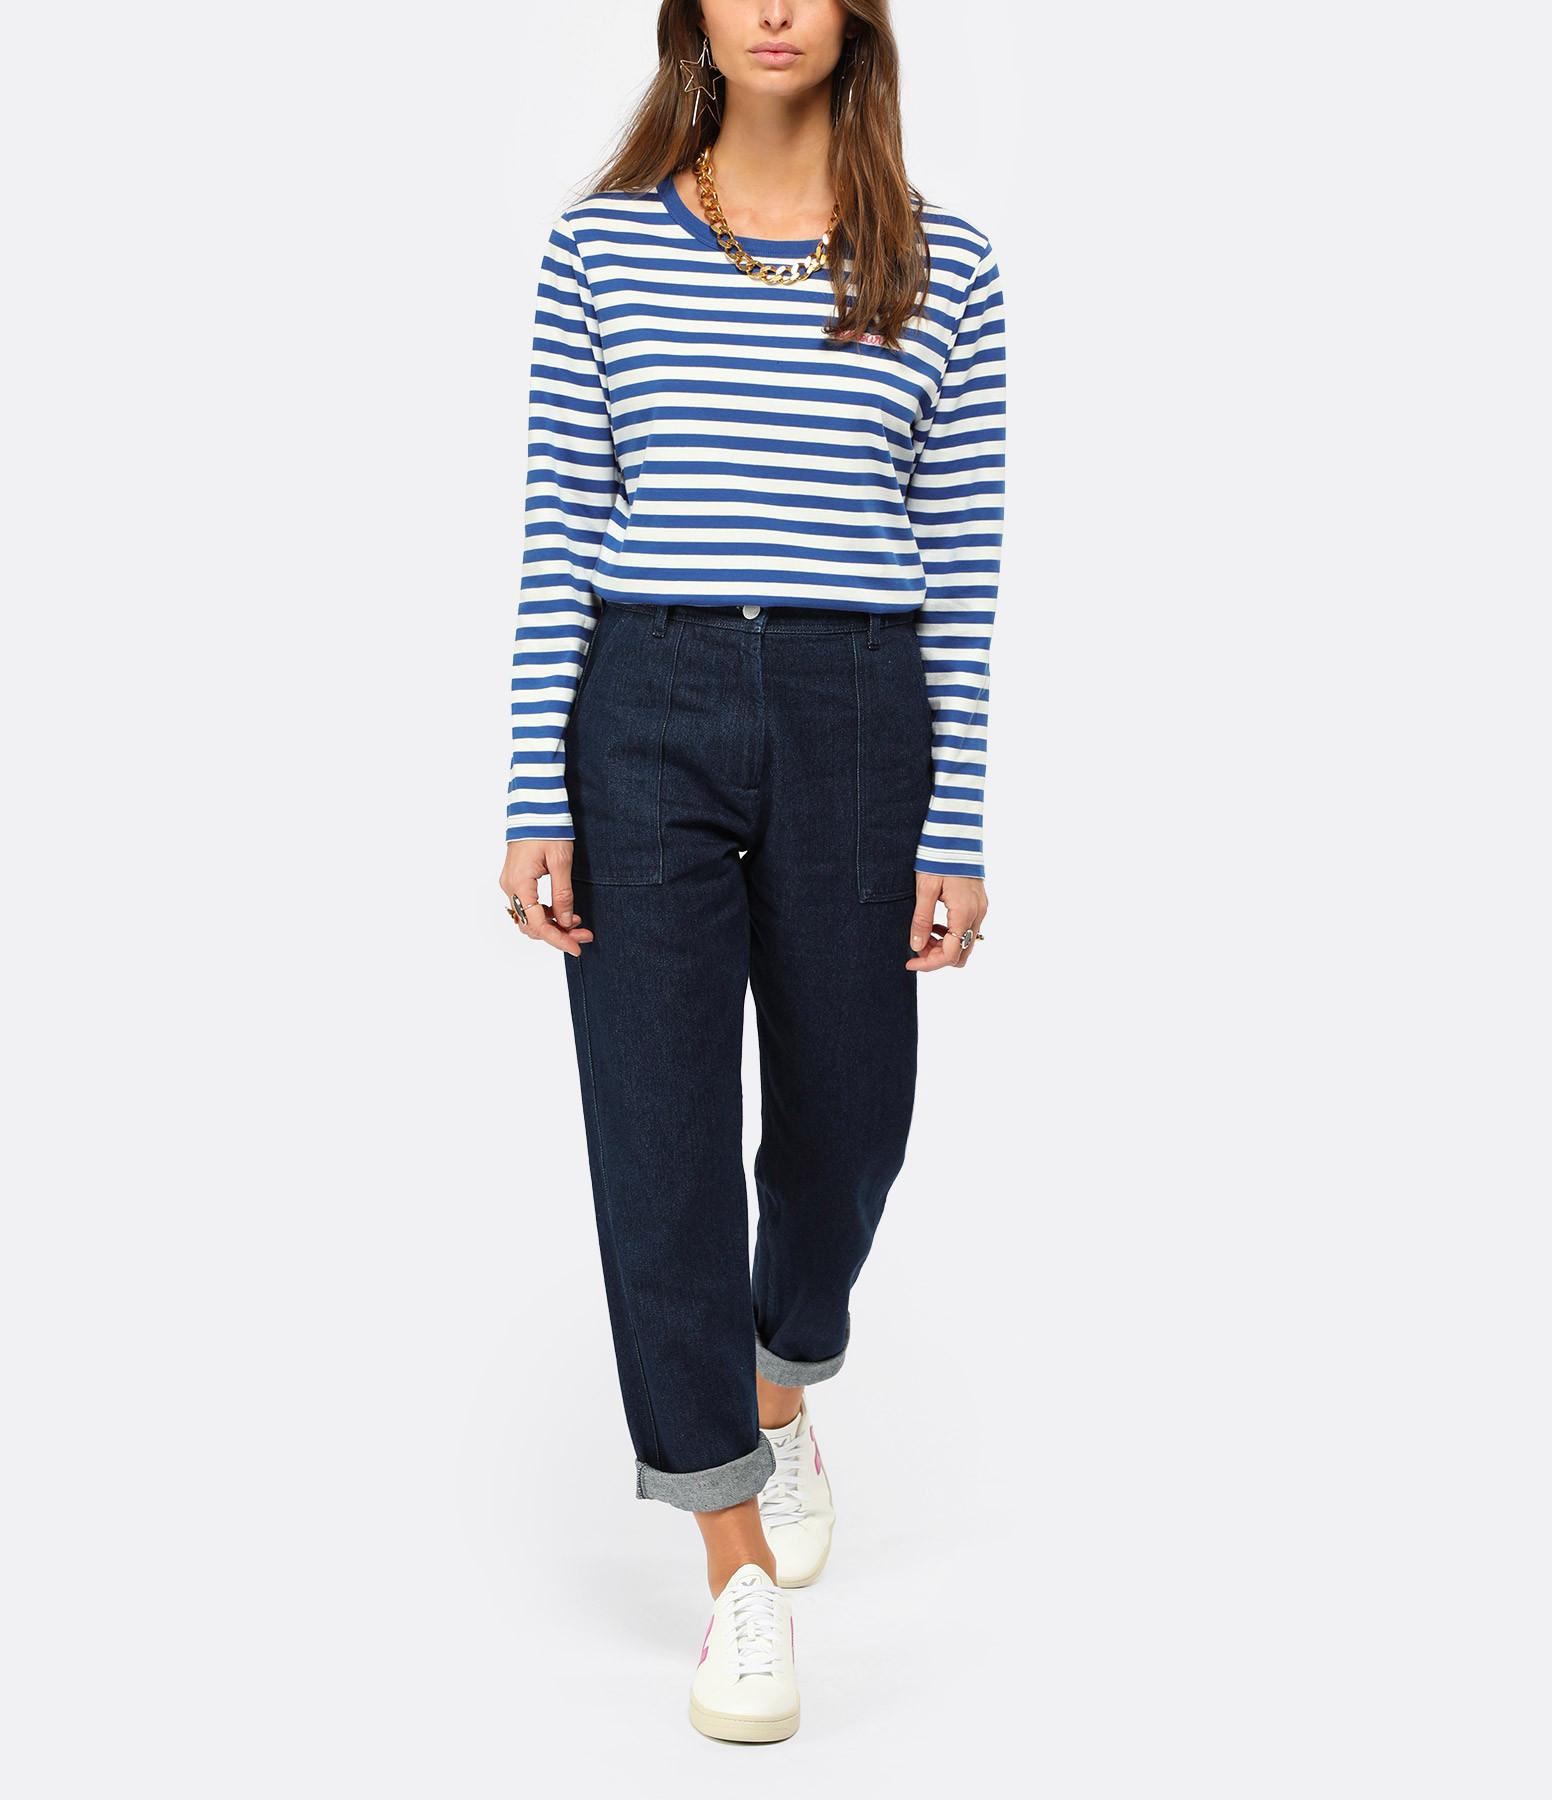 MAISON LABICHE - Tee-shirt Amour Rayures Bleu Blanc